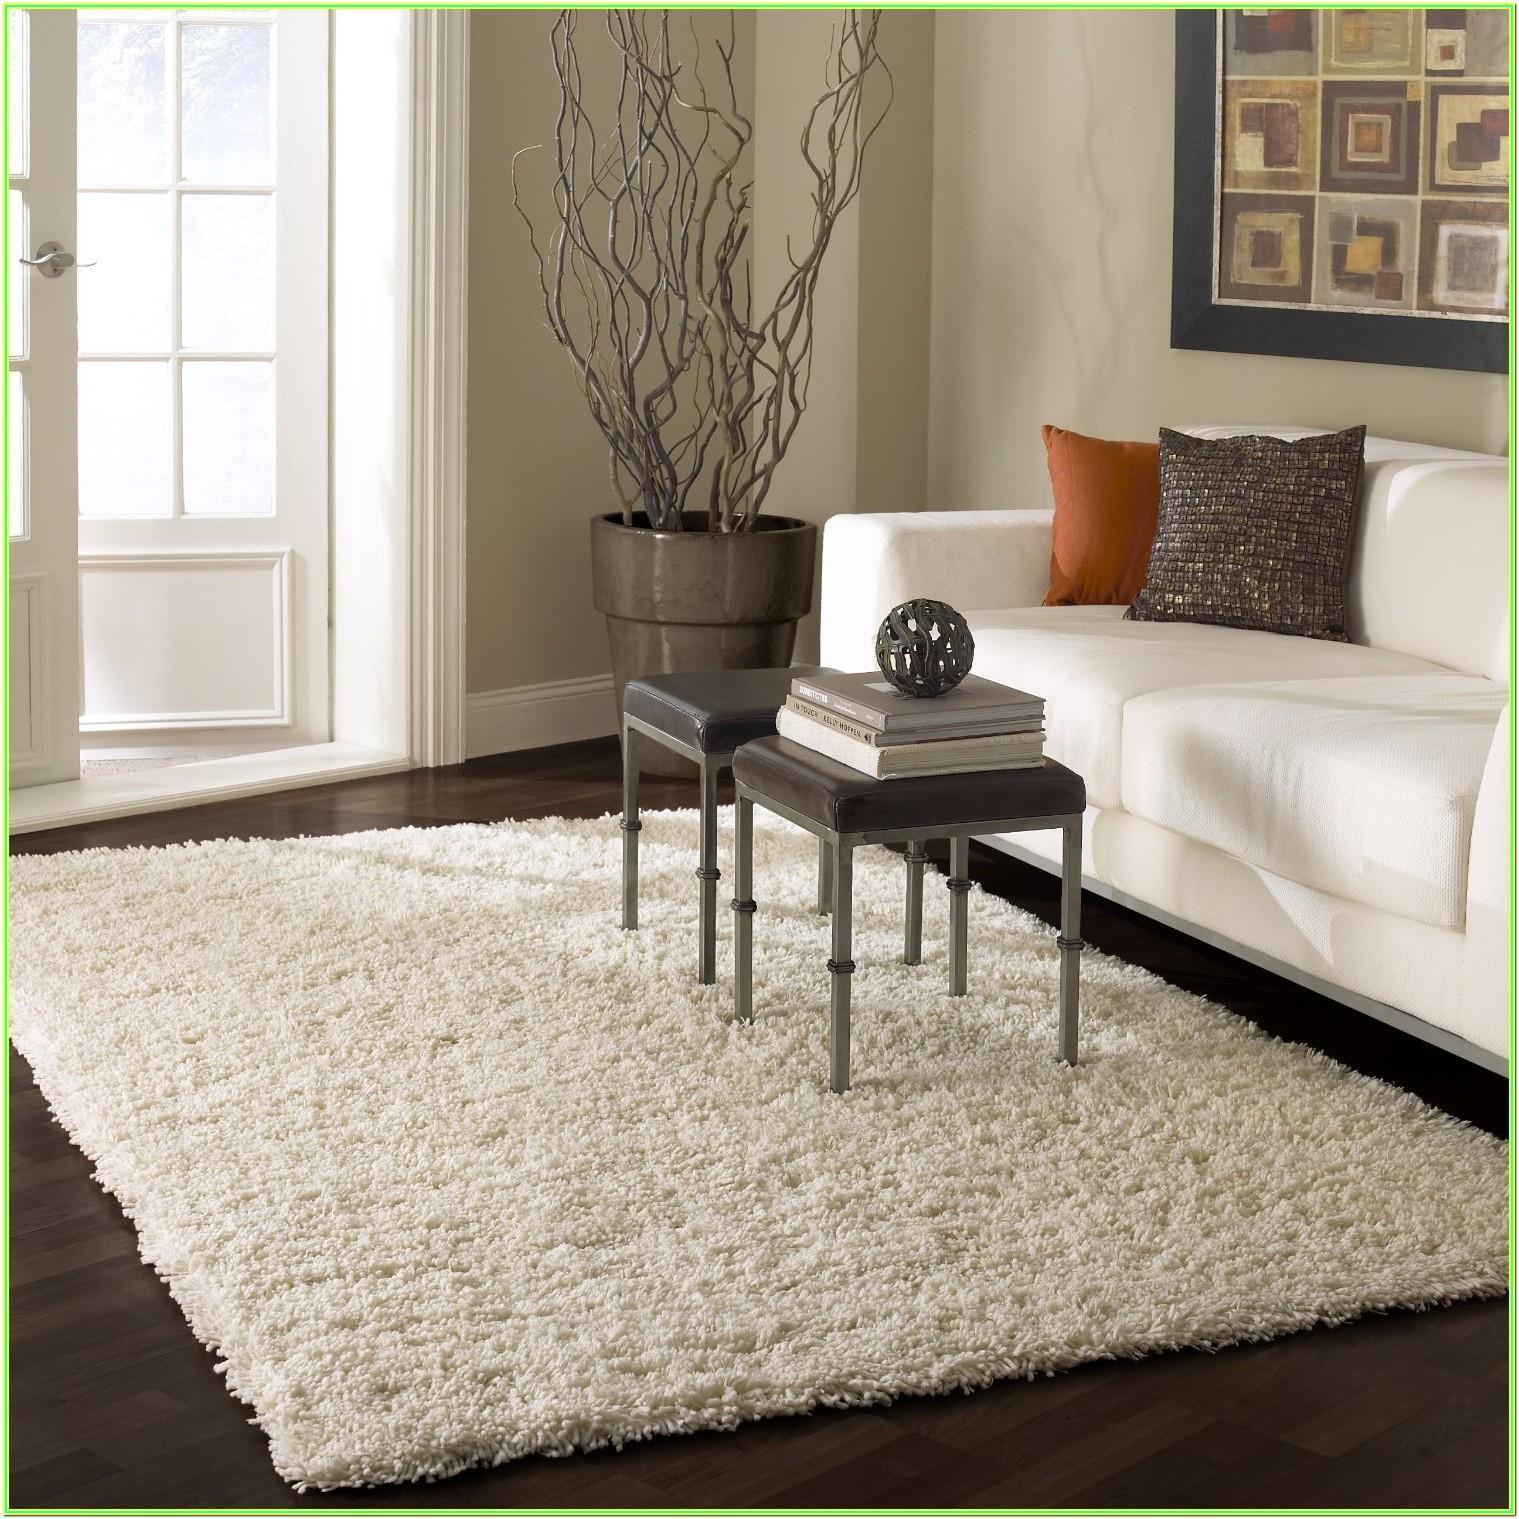 Living Room Plush Area Rugs